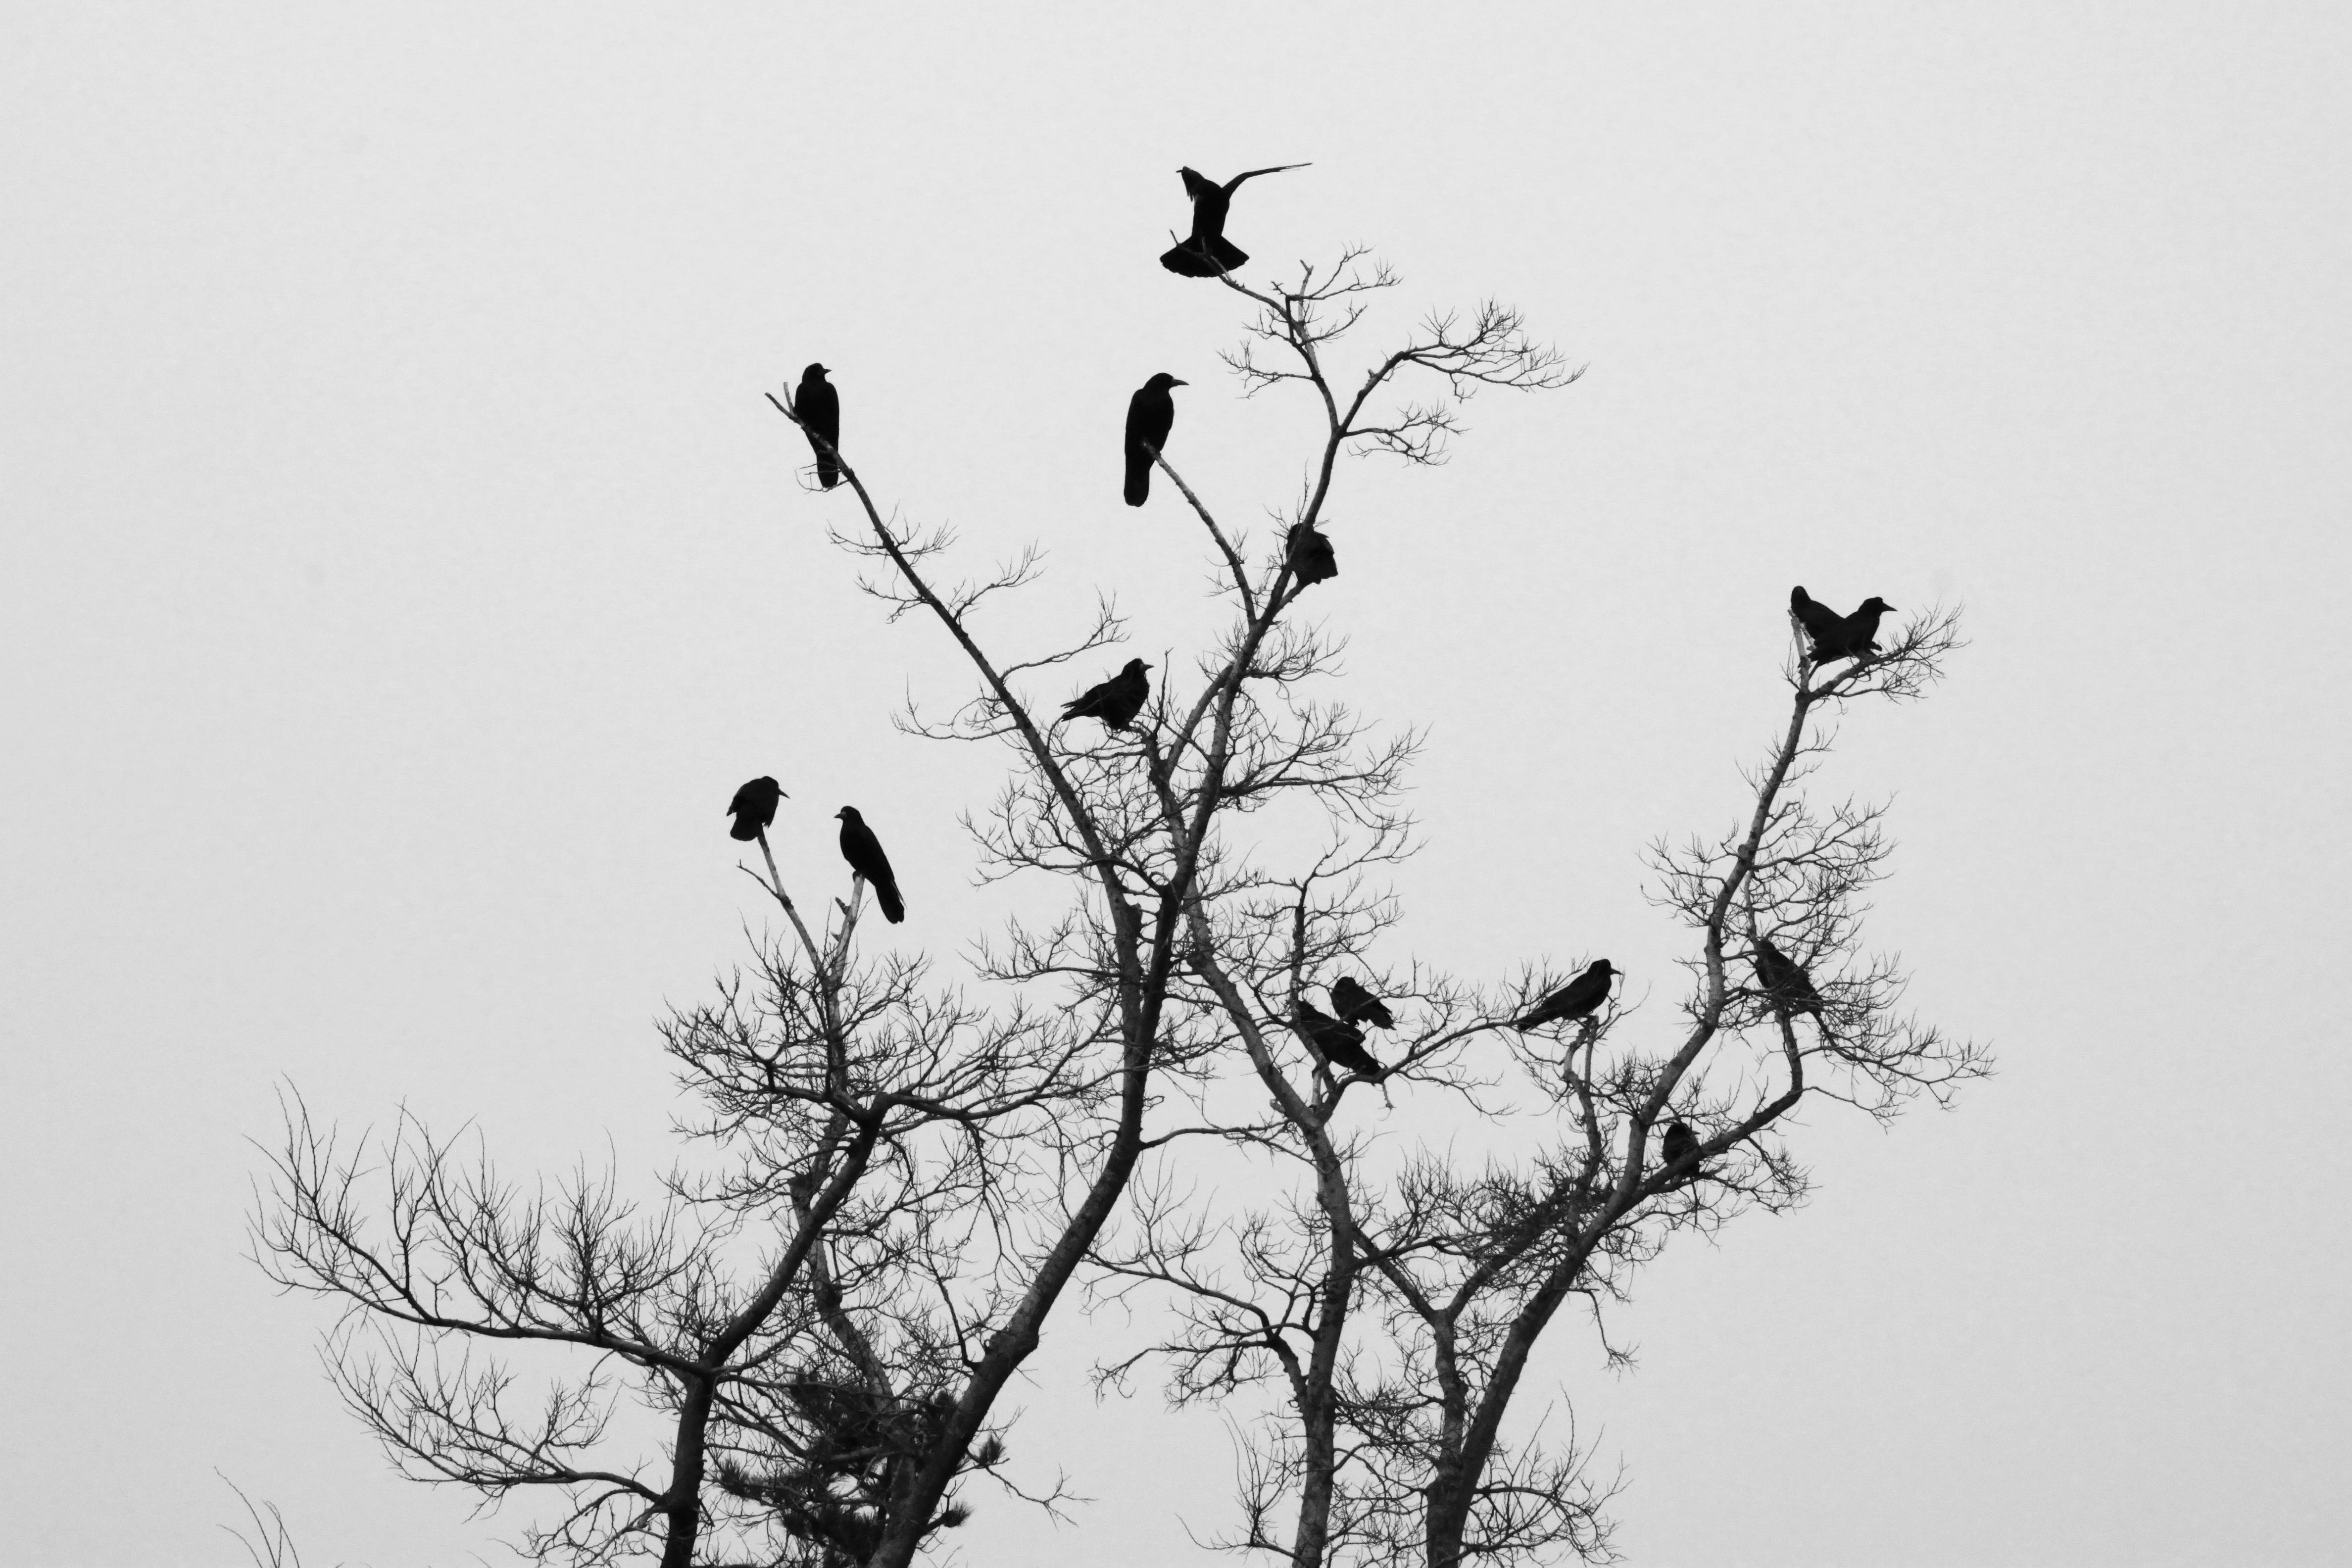 80+ Gambar Siluet Hewan Burung HD Terbaru